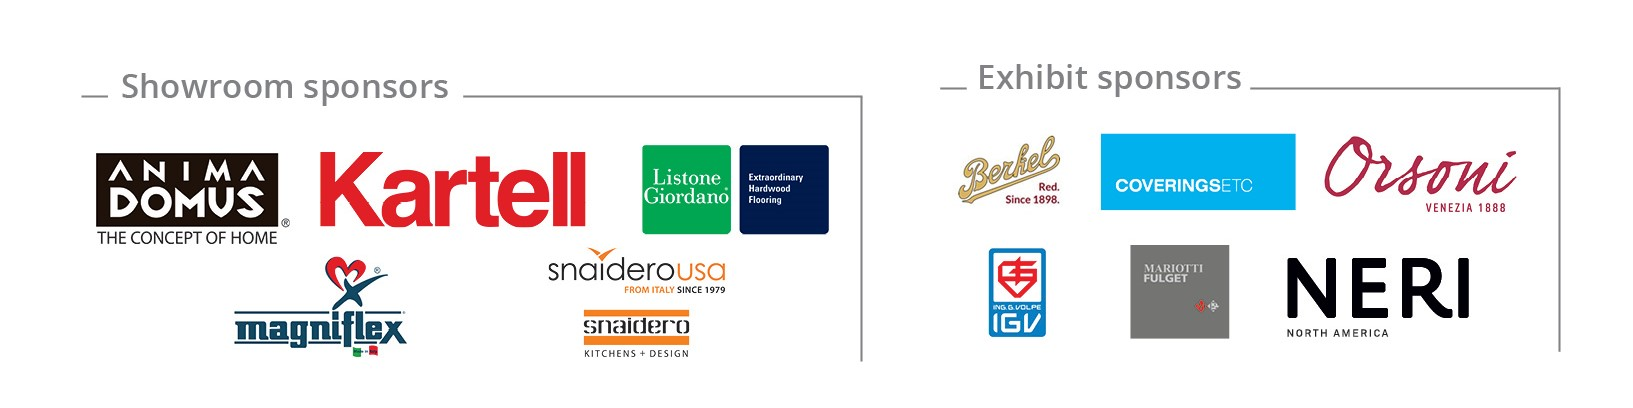 Solo sponsors